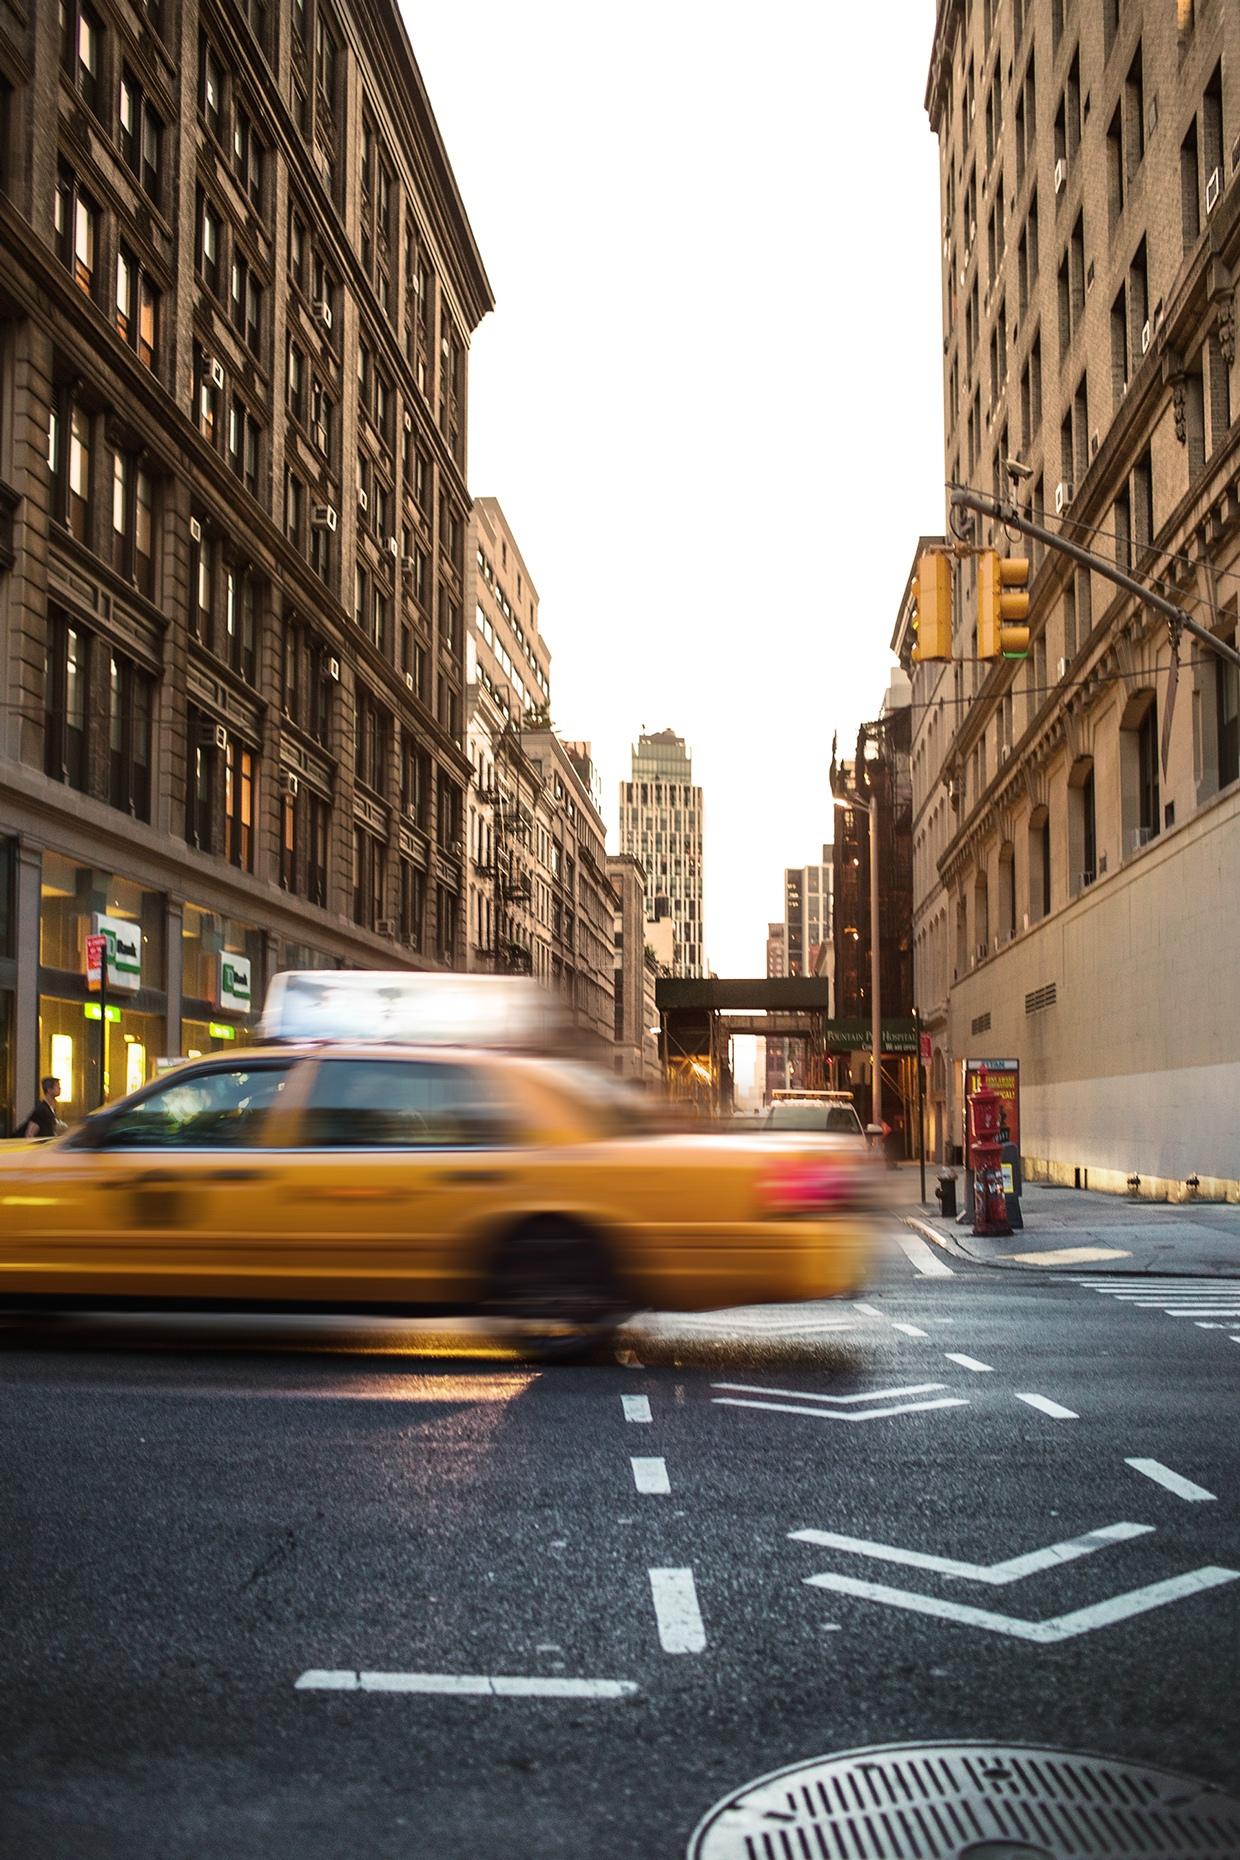 NYC cab street photography